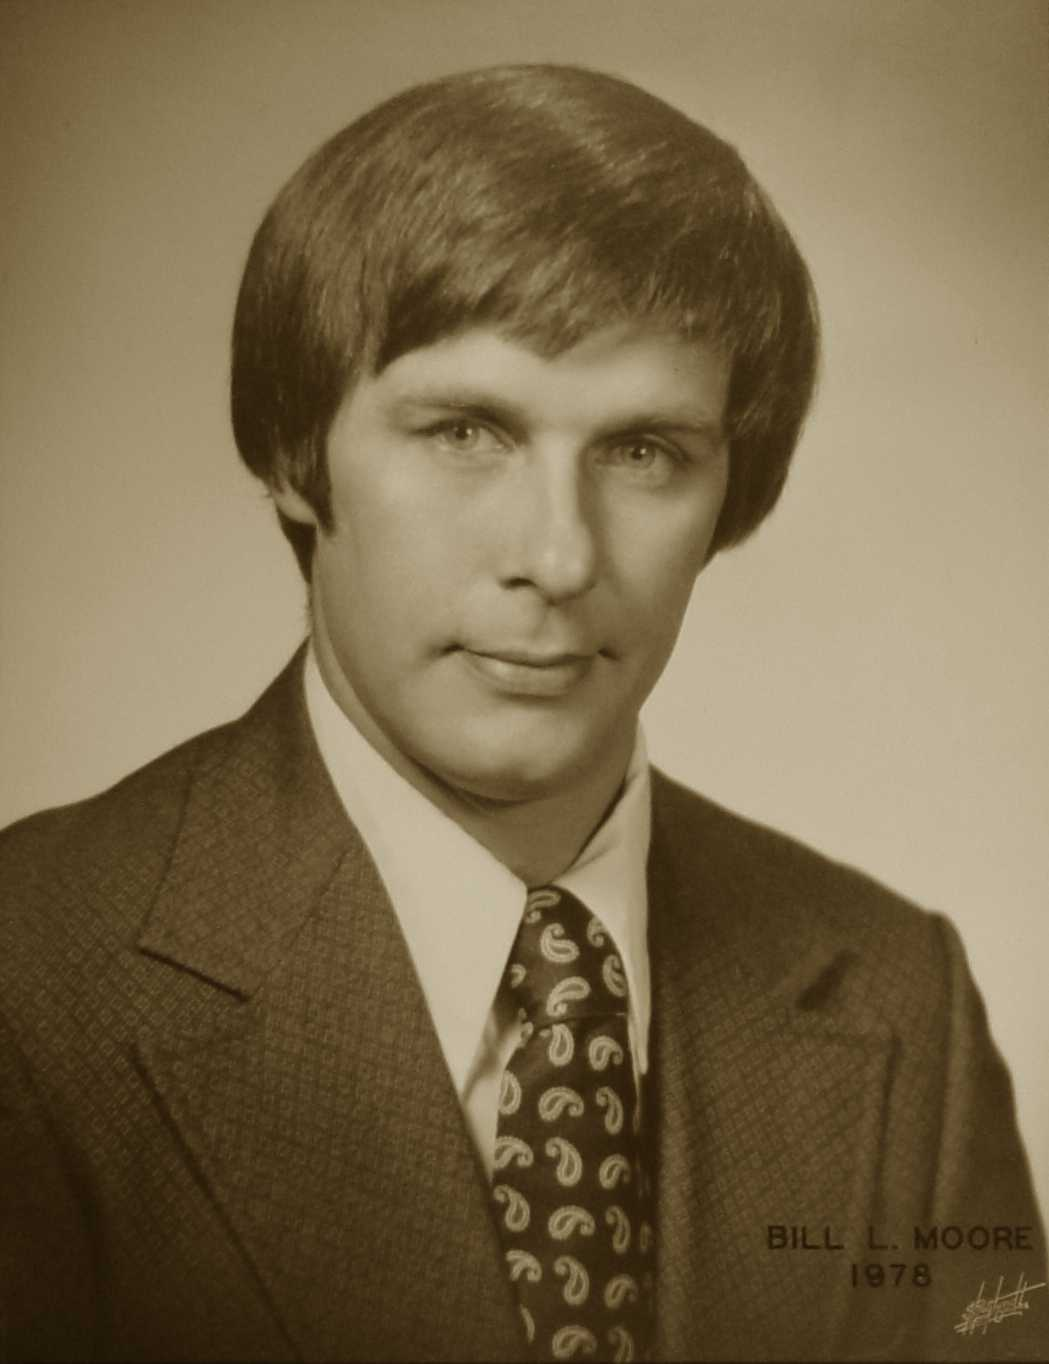 Bill L. Moore, 1978